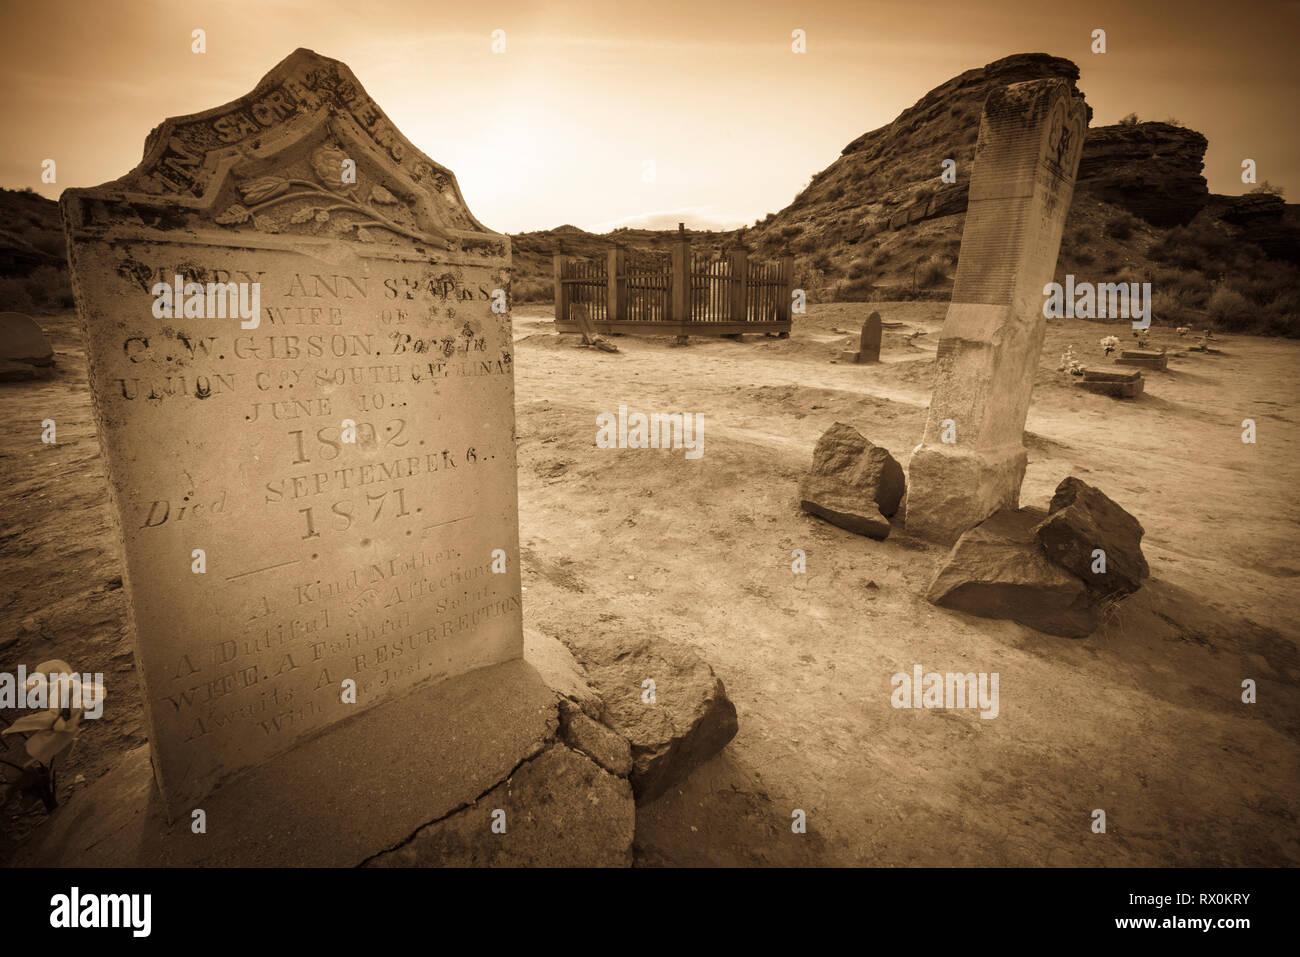 Tombstones in the Grafton Cemetery, Grafton ghost town, Utah USA Stock Photo